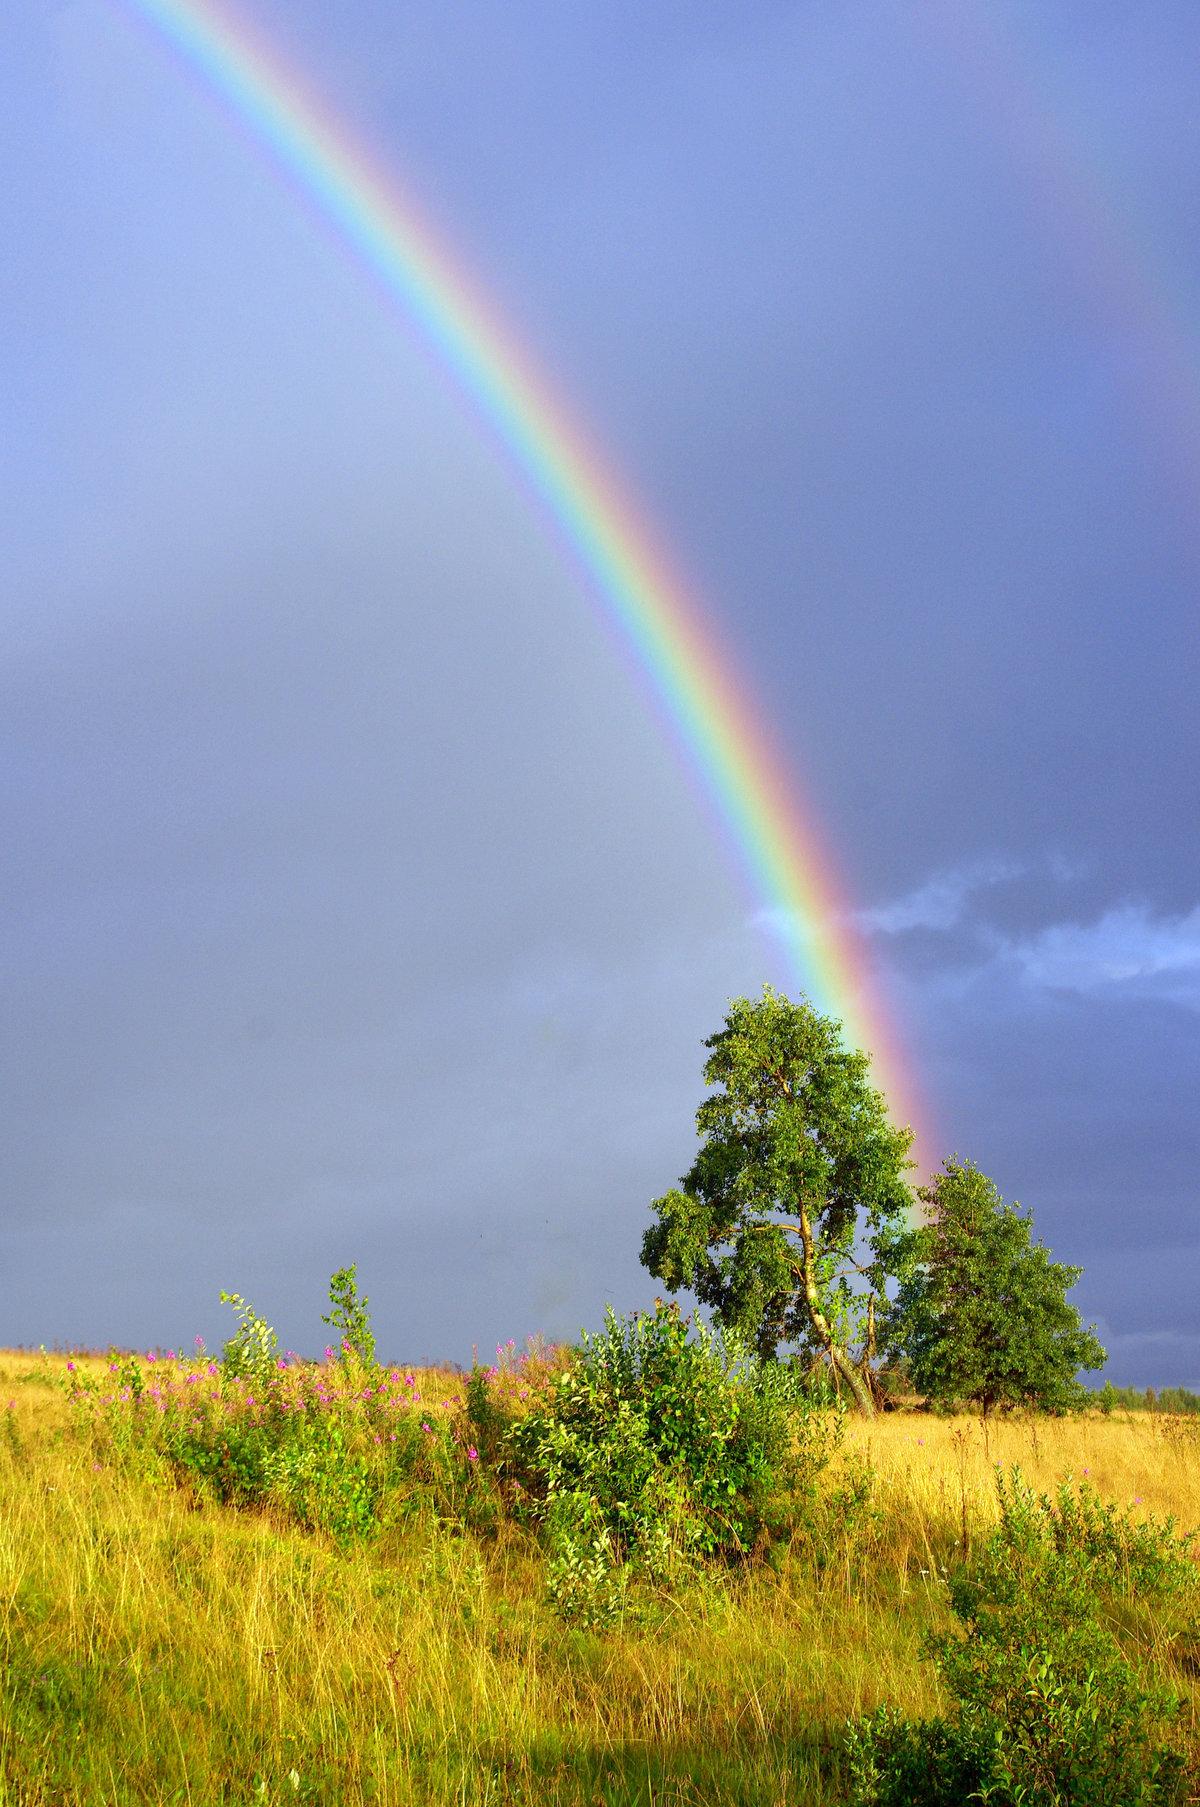 неживая природа летом картинки данном окошке можно